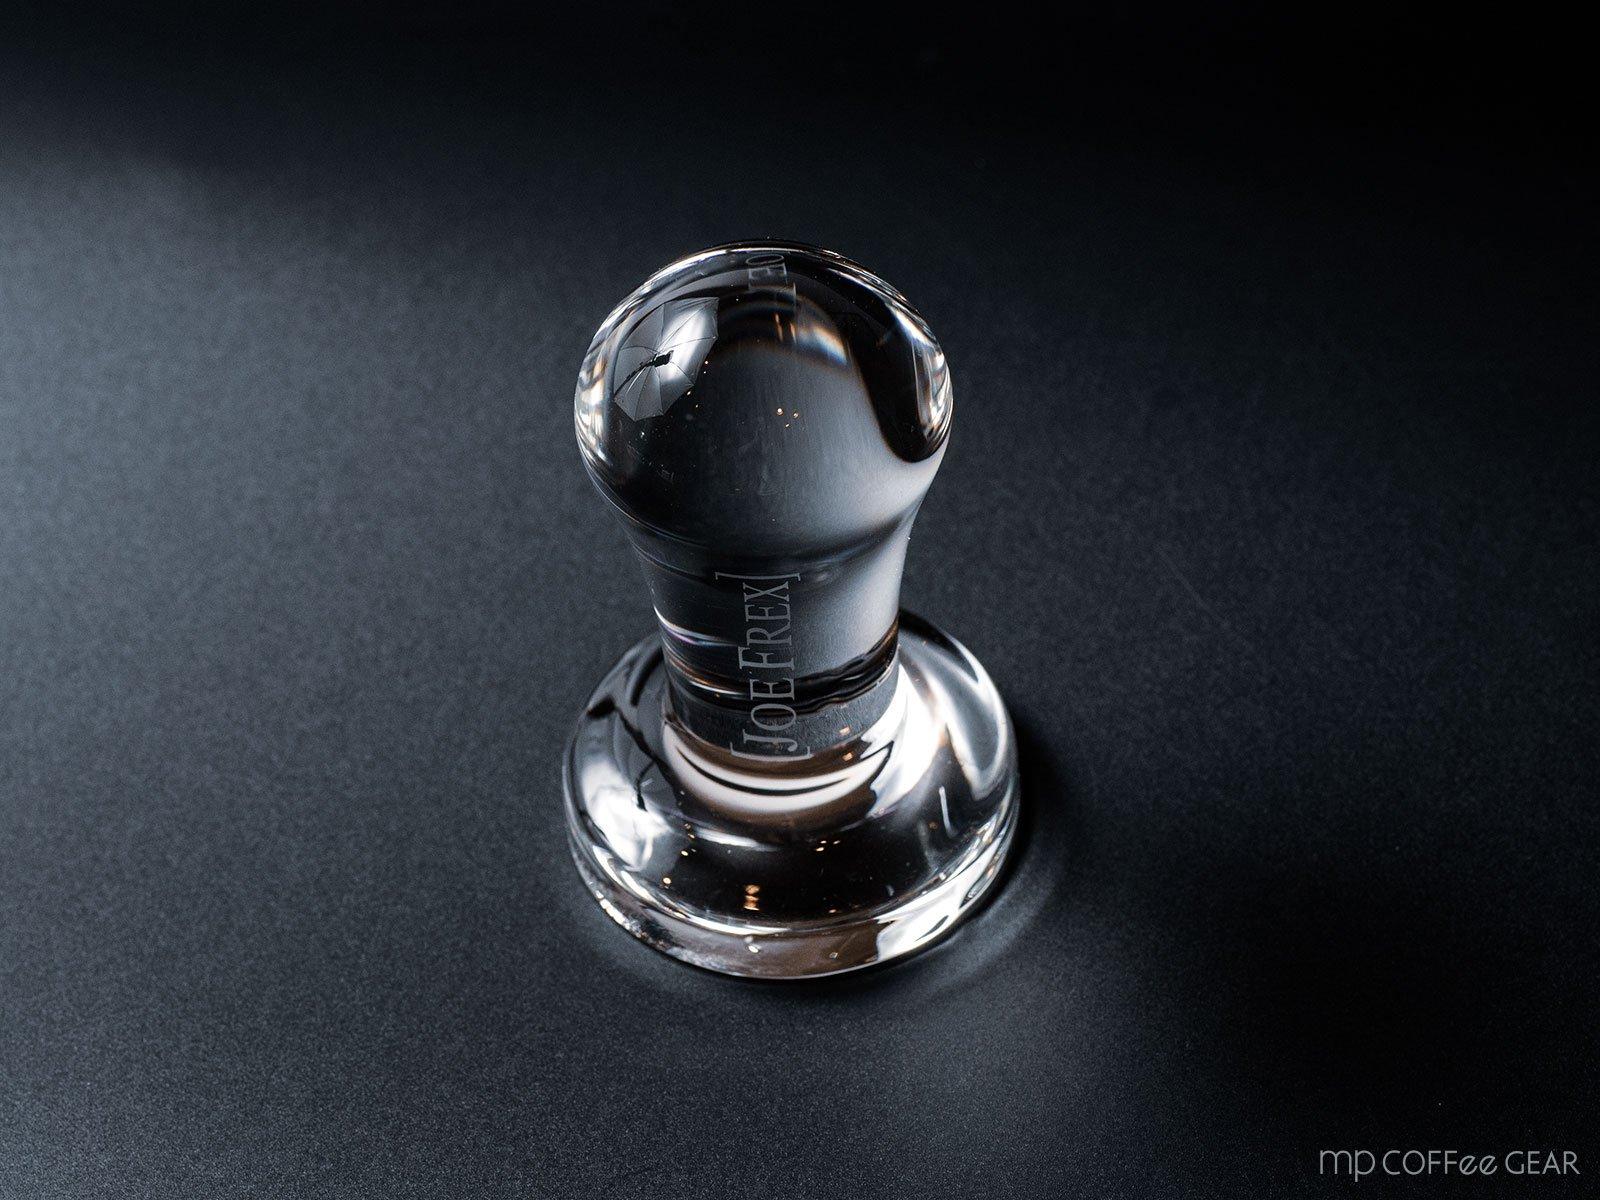 Joe frex グラスコーヒータンパー 58mm